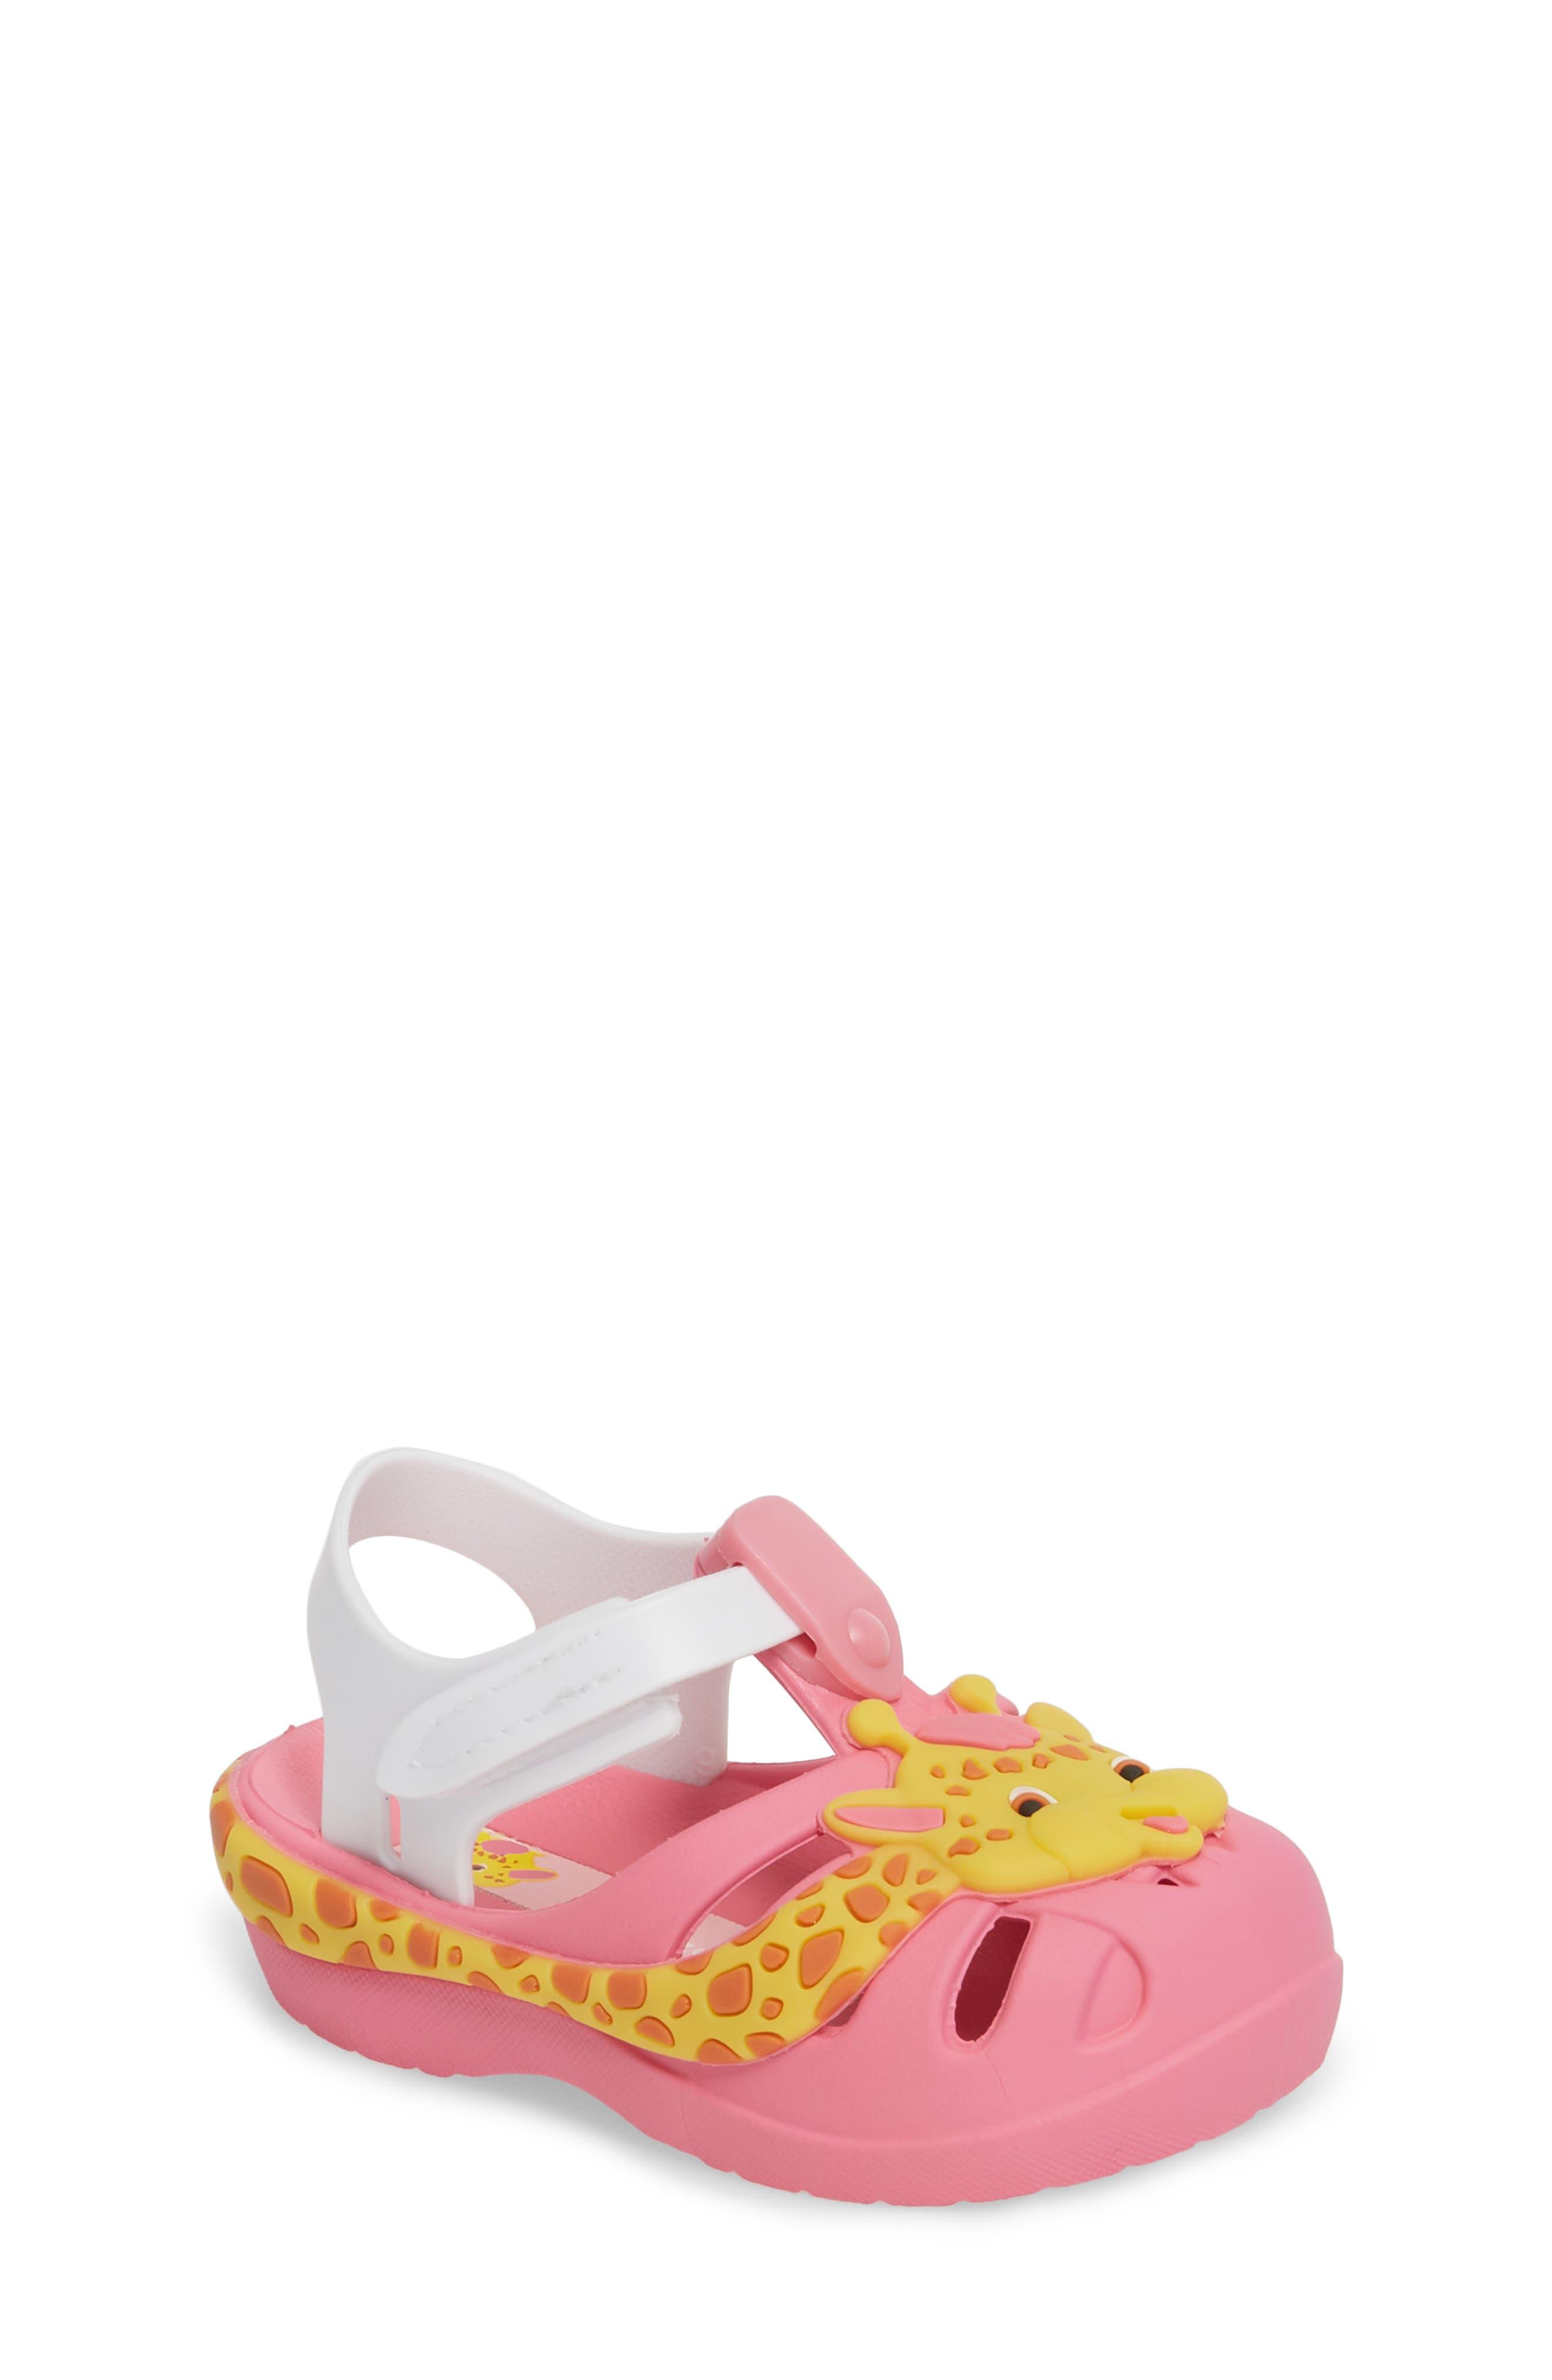 Summer Baby Waterproof Sandal,                             Main thumbnail 1, color,                             Pink/ White